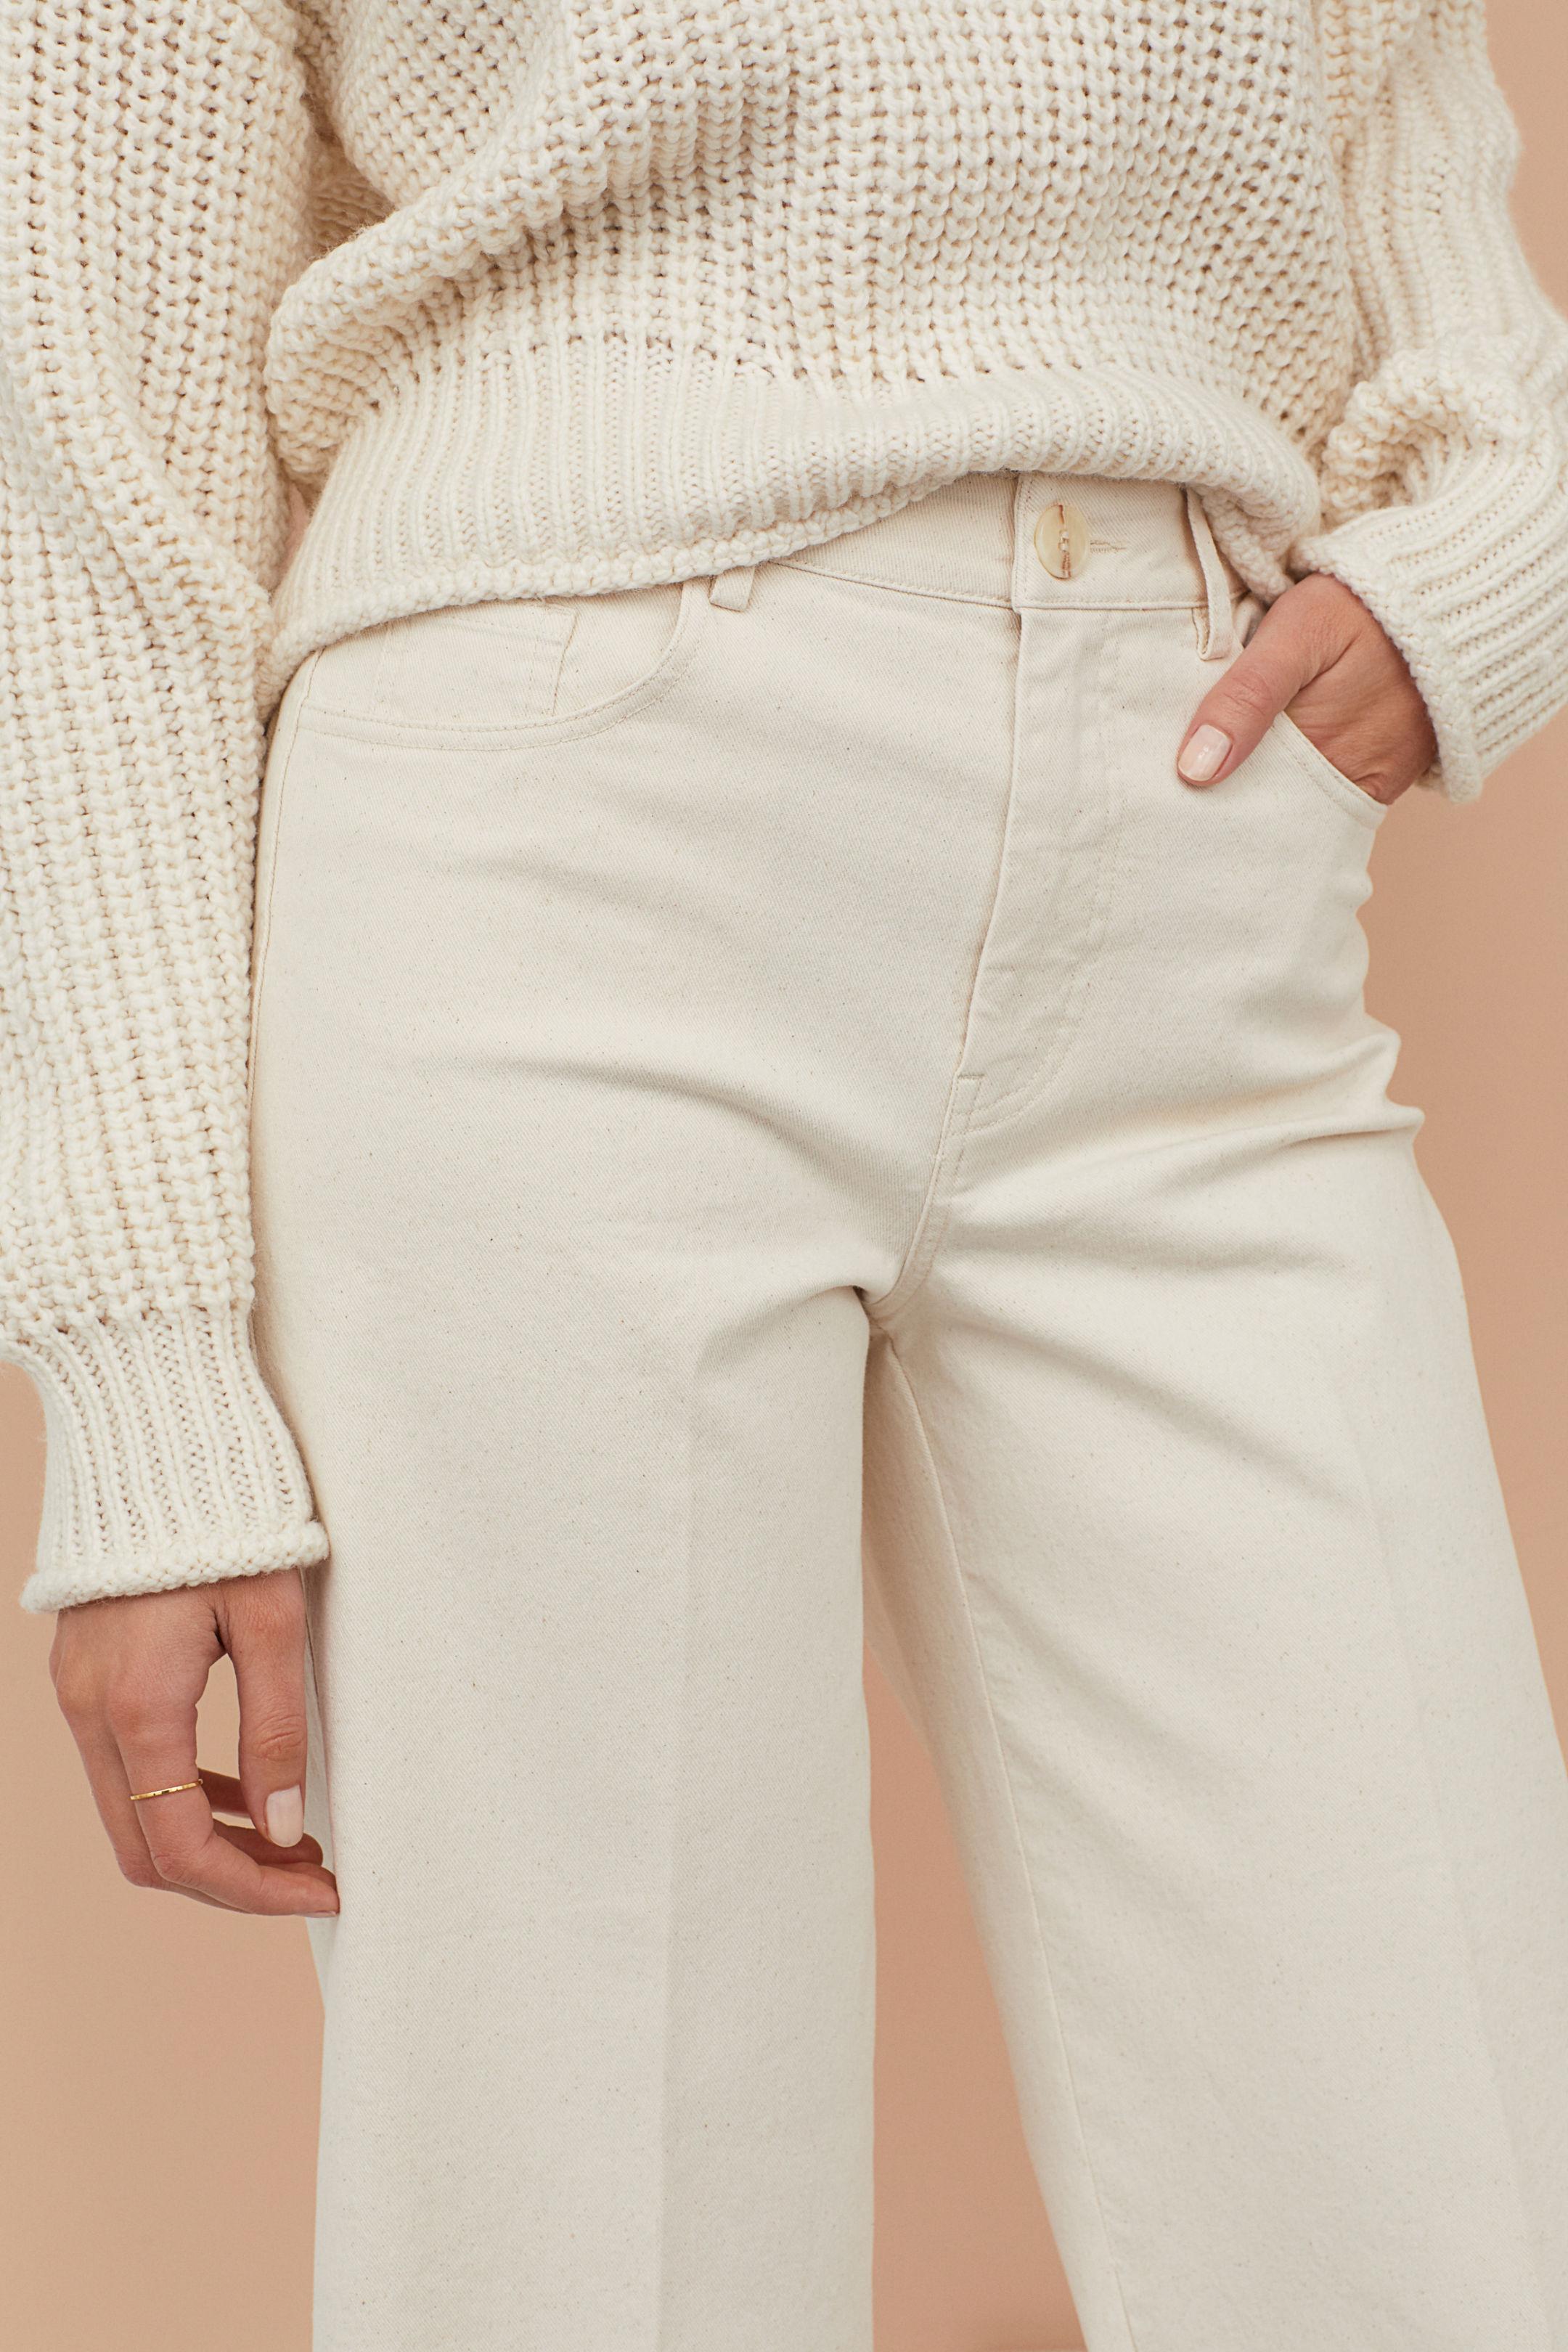 New Season Denim_HM Off-White Jeans.jpeg